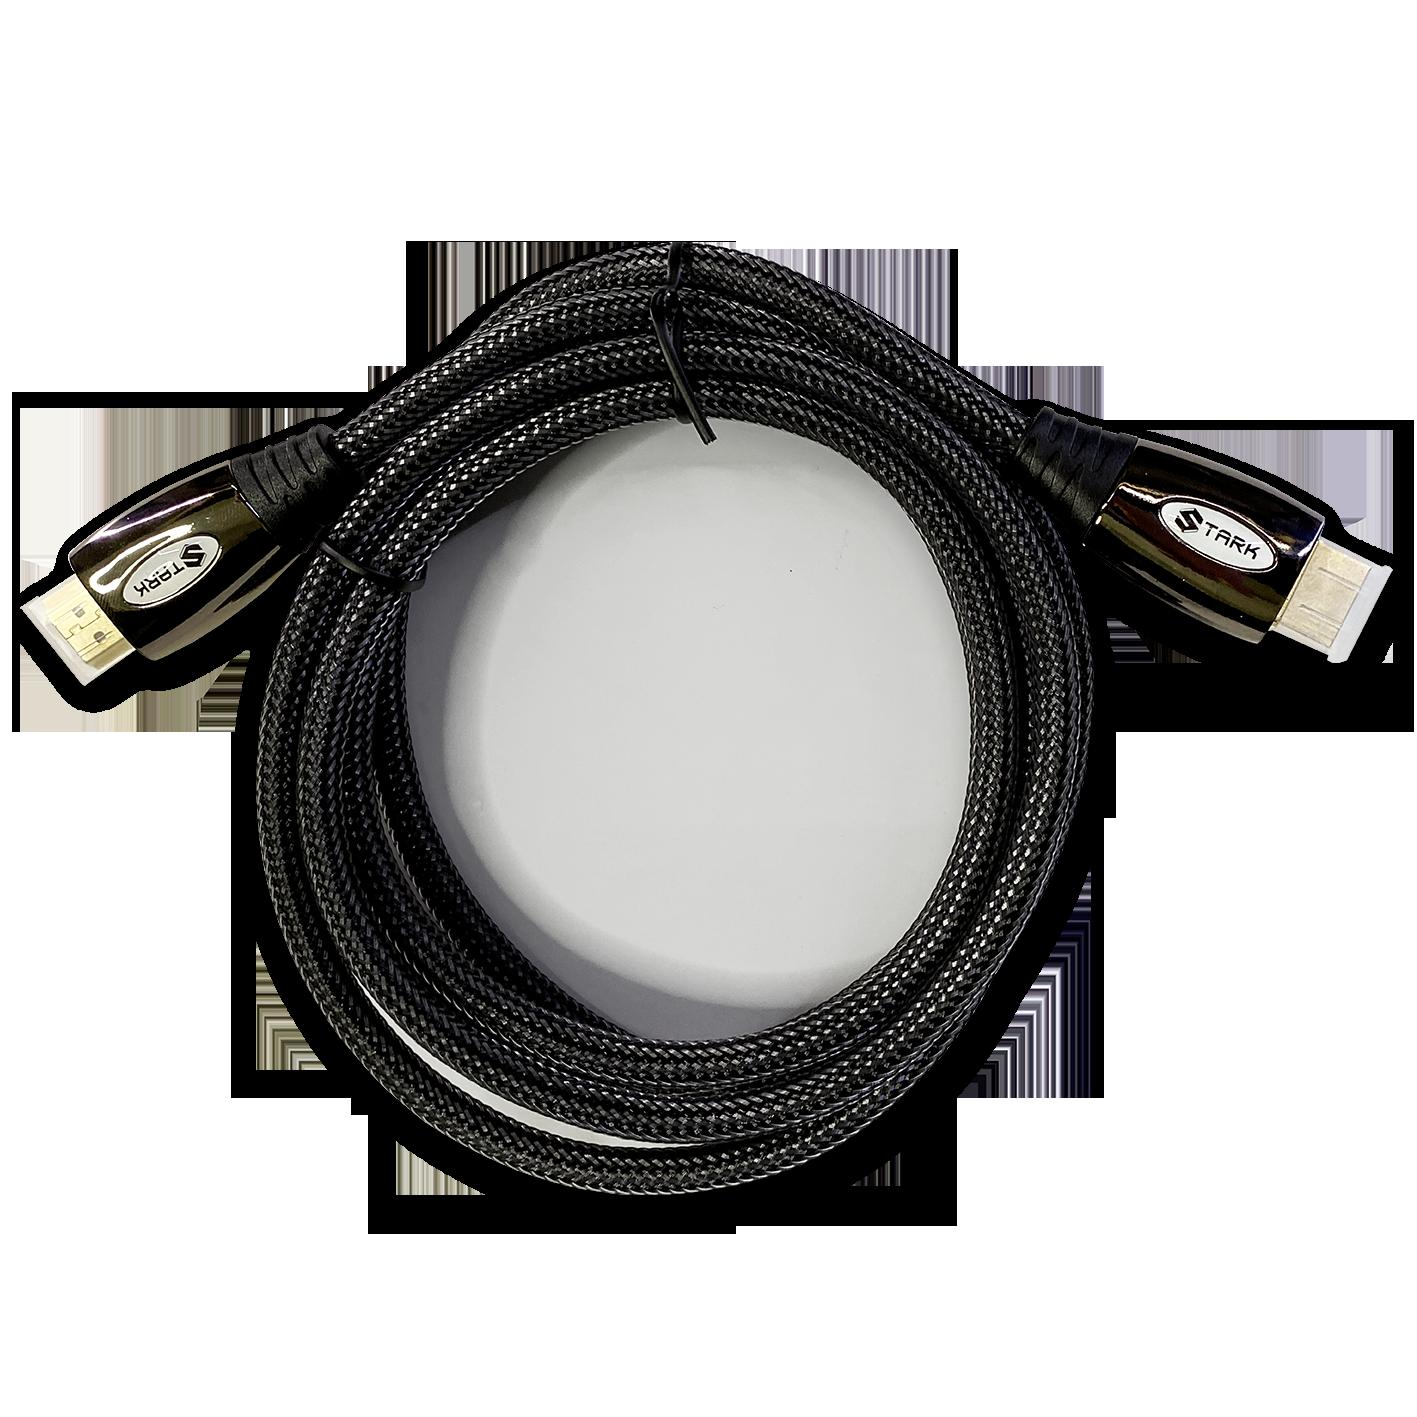 STARK kabl HDMI M-M, pozlaćen 4K(Ultra HD), metalno kućište, podržava 3D, 2m (Slika 4)